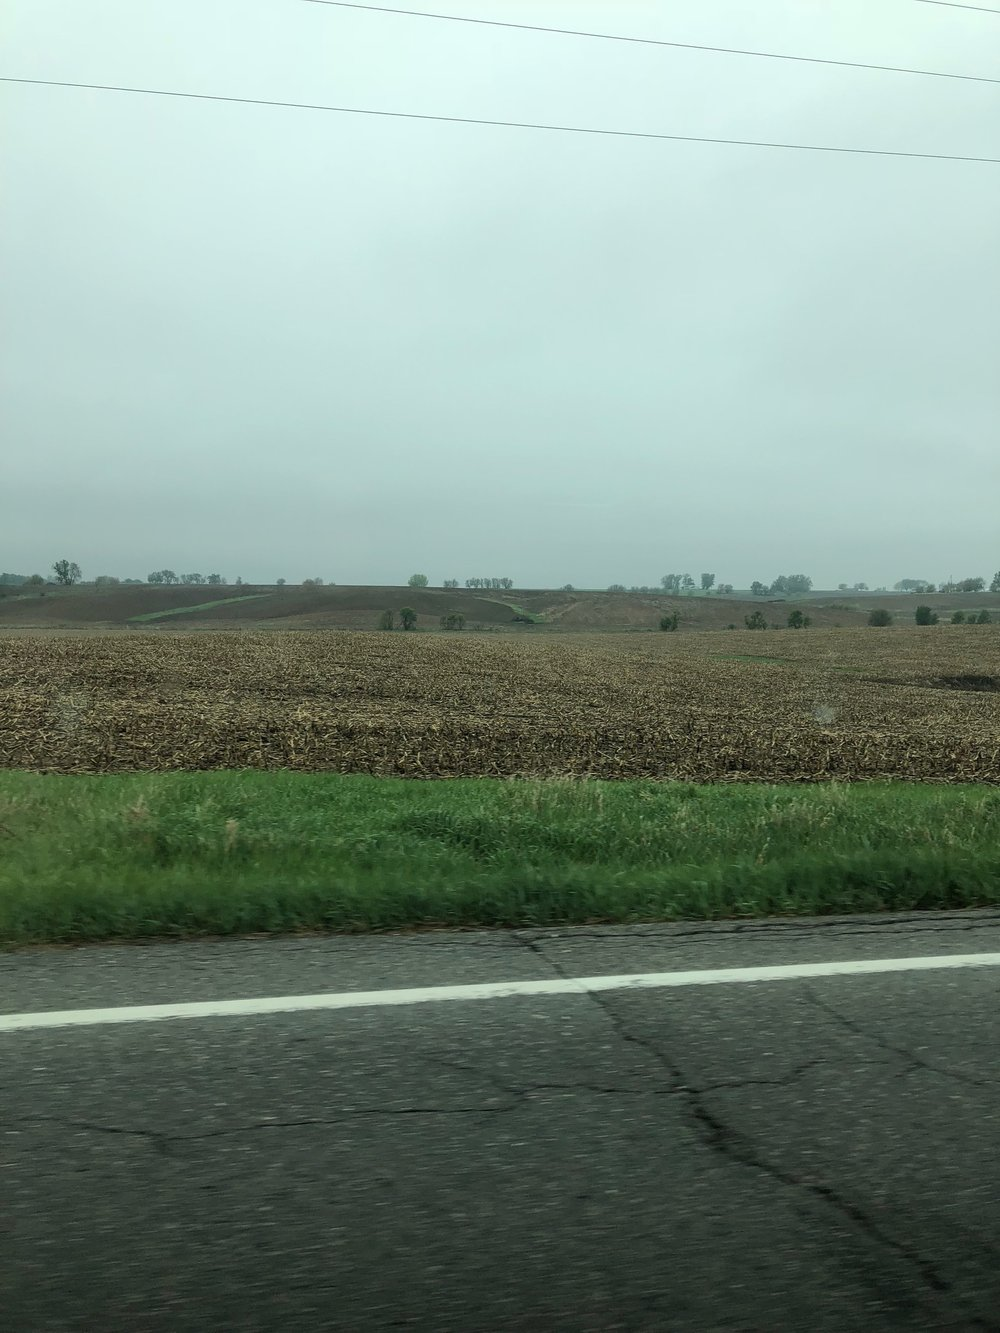 The Iowa farmland was beautiful!